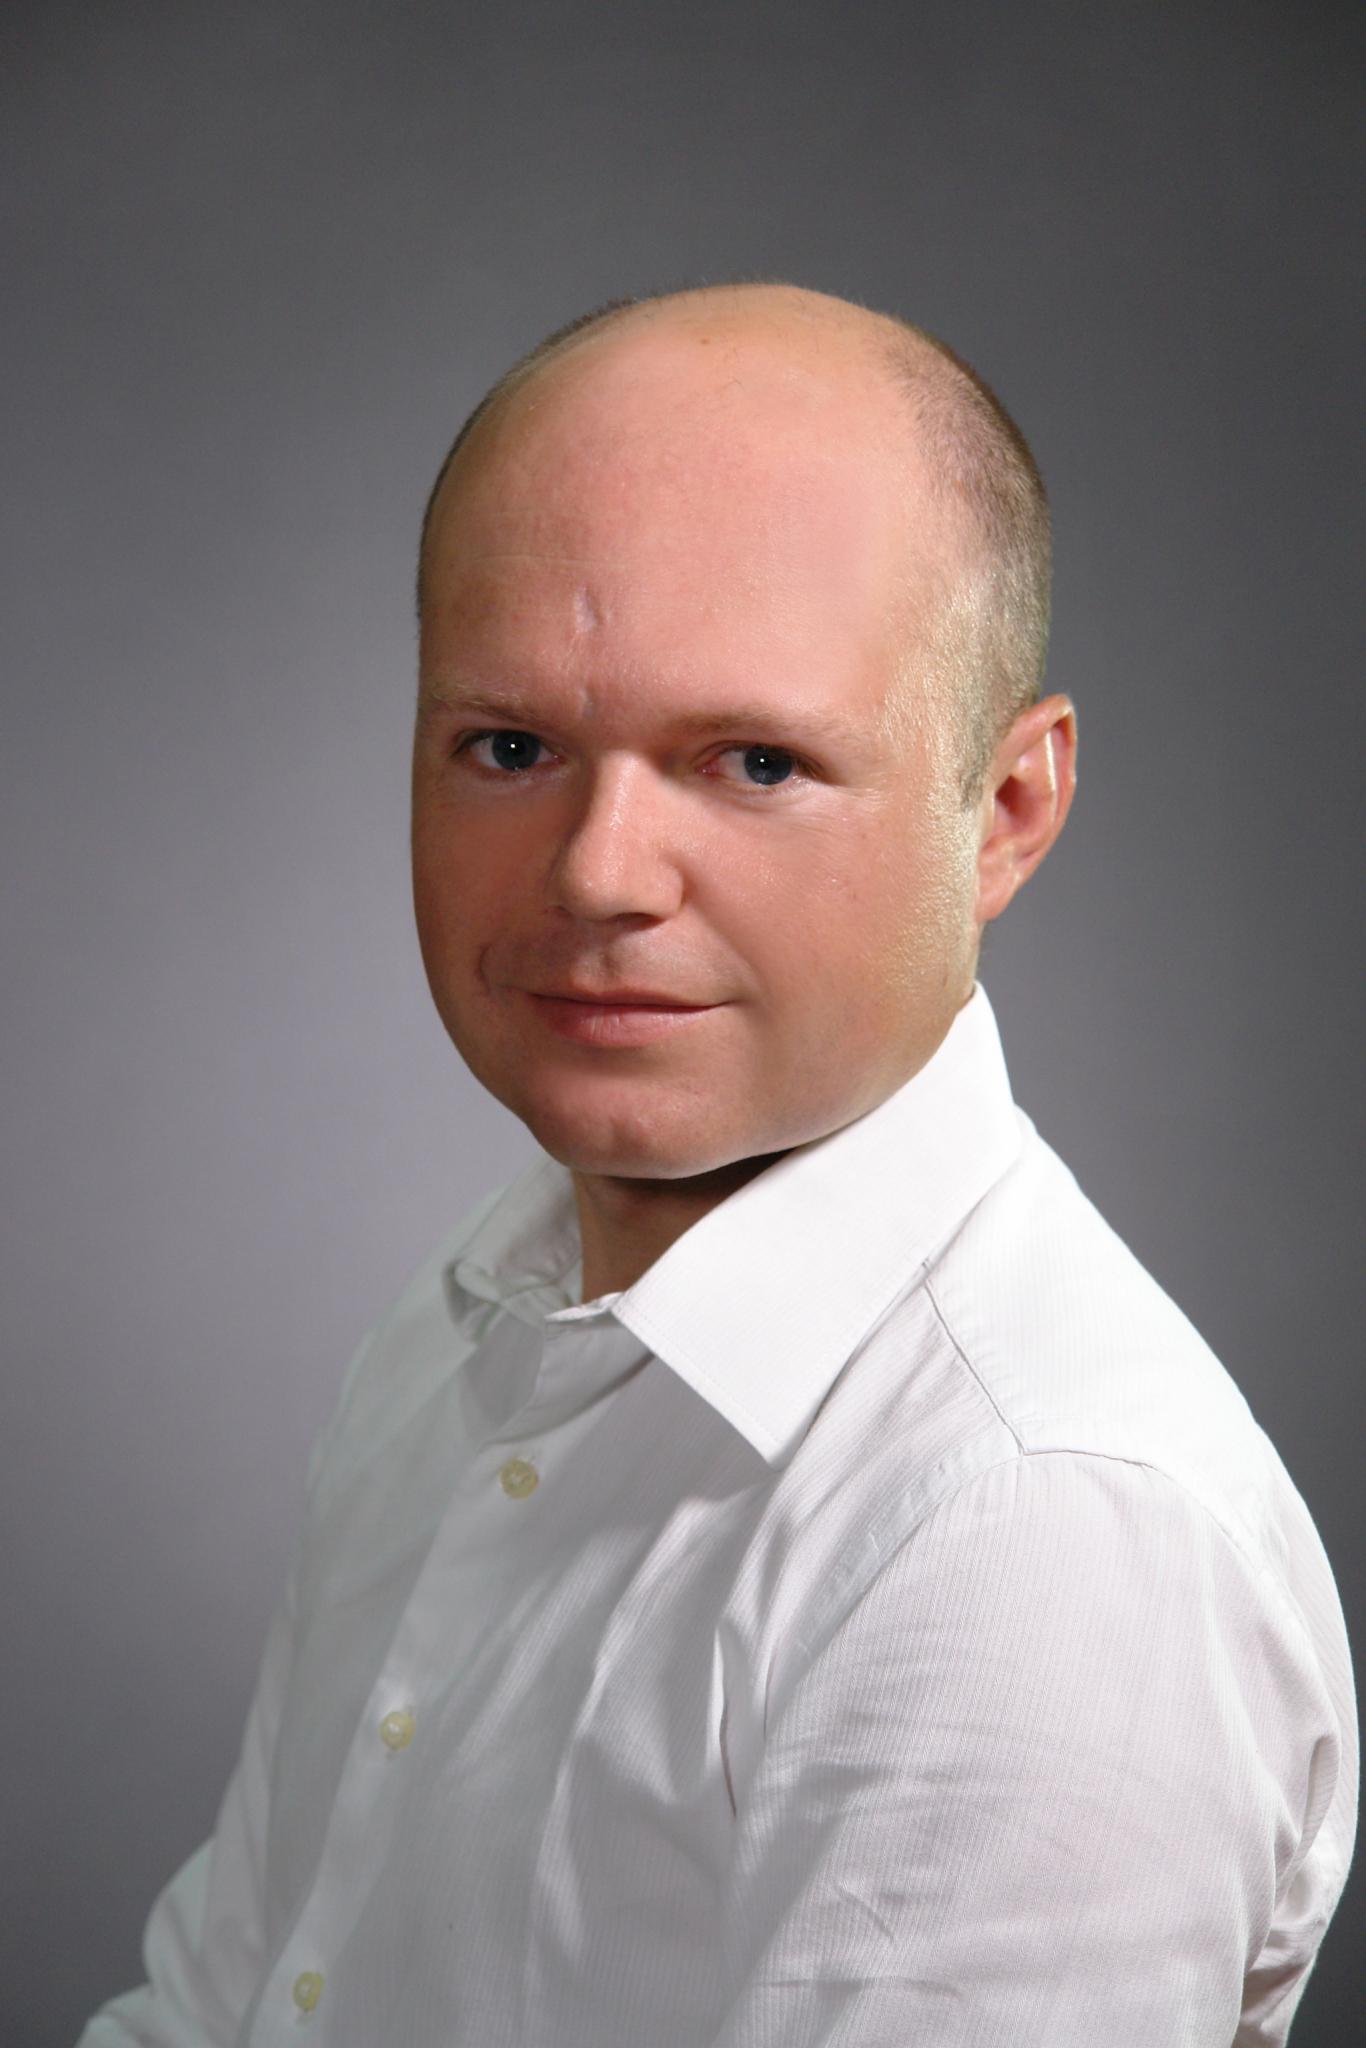 Vitaliy Bigdai